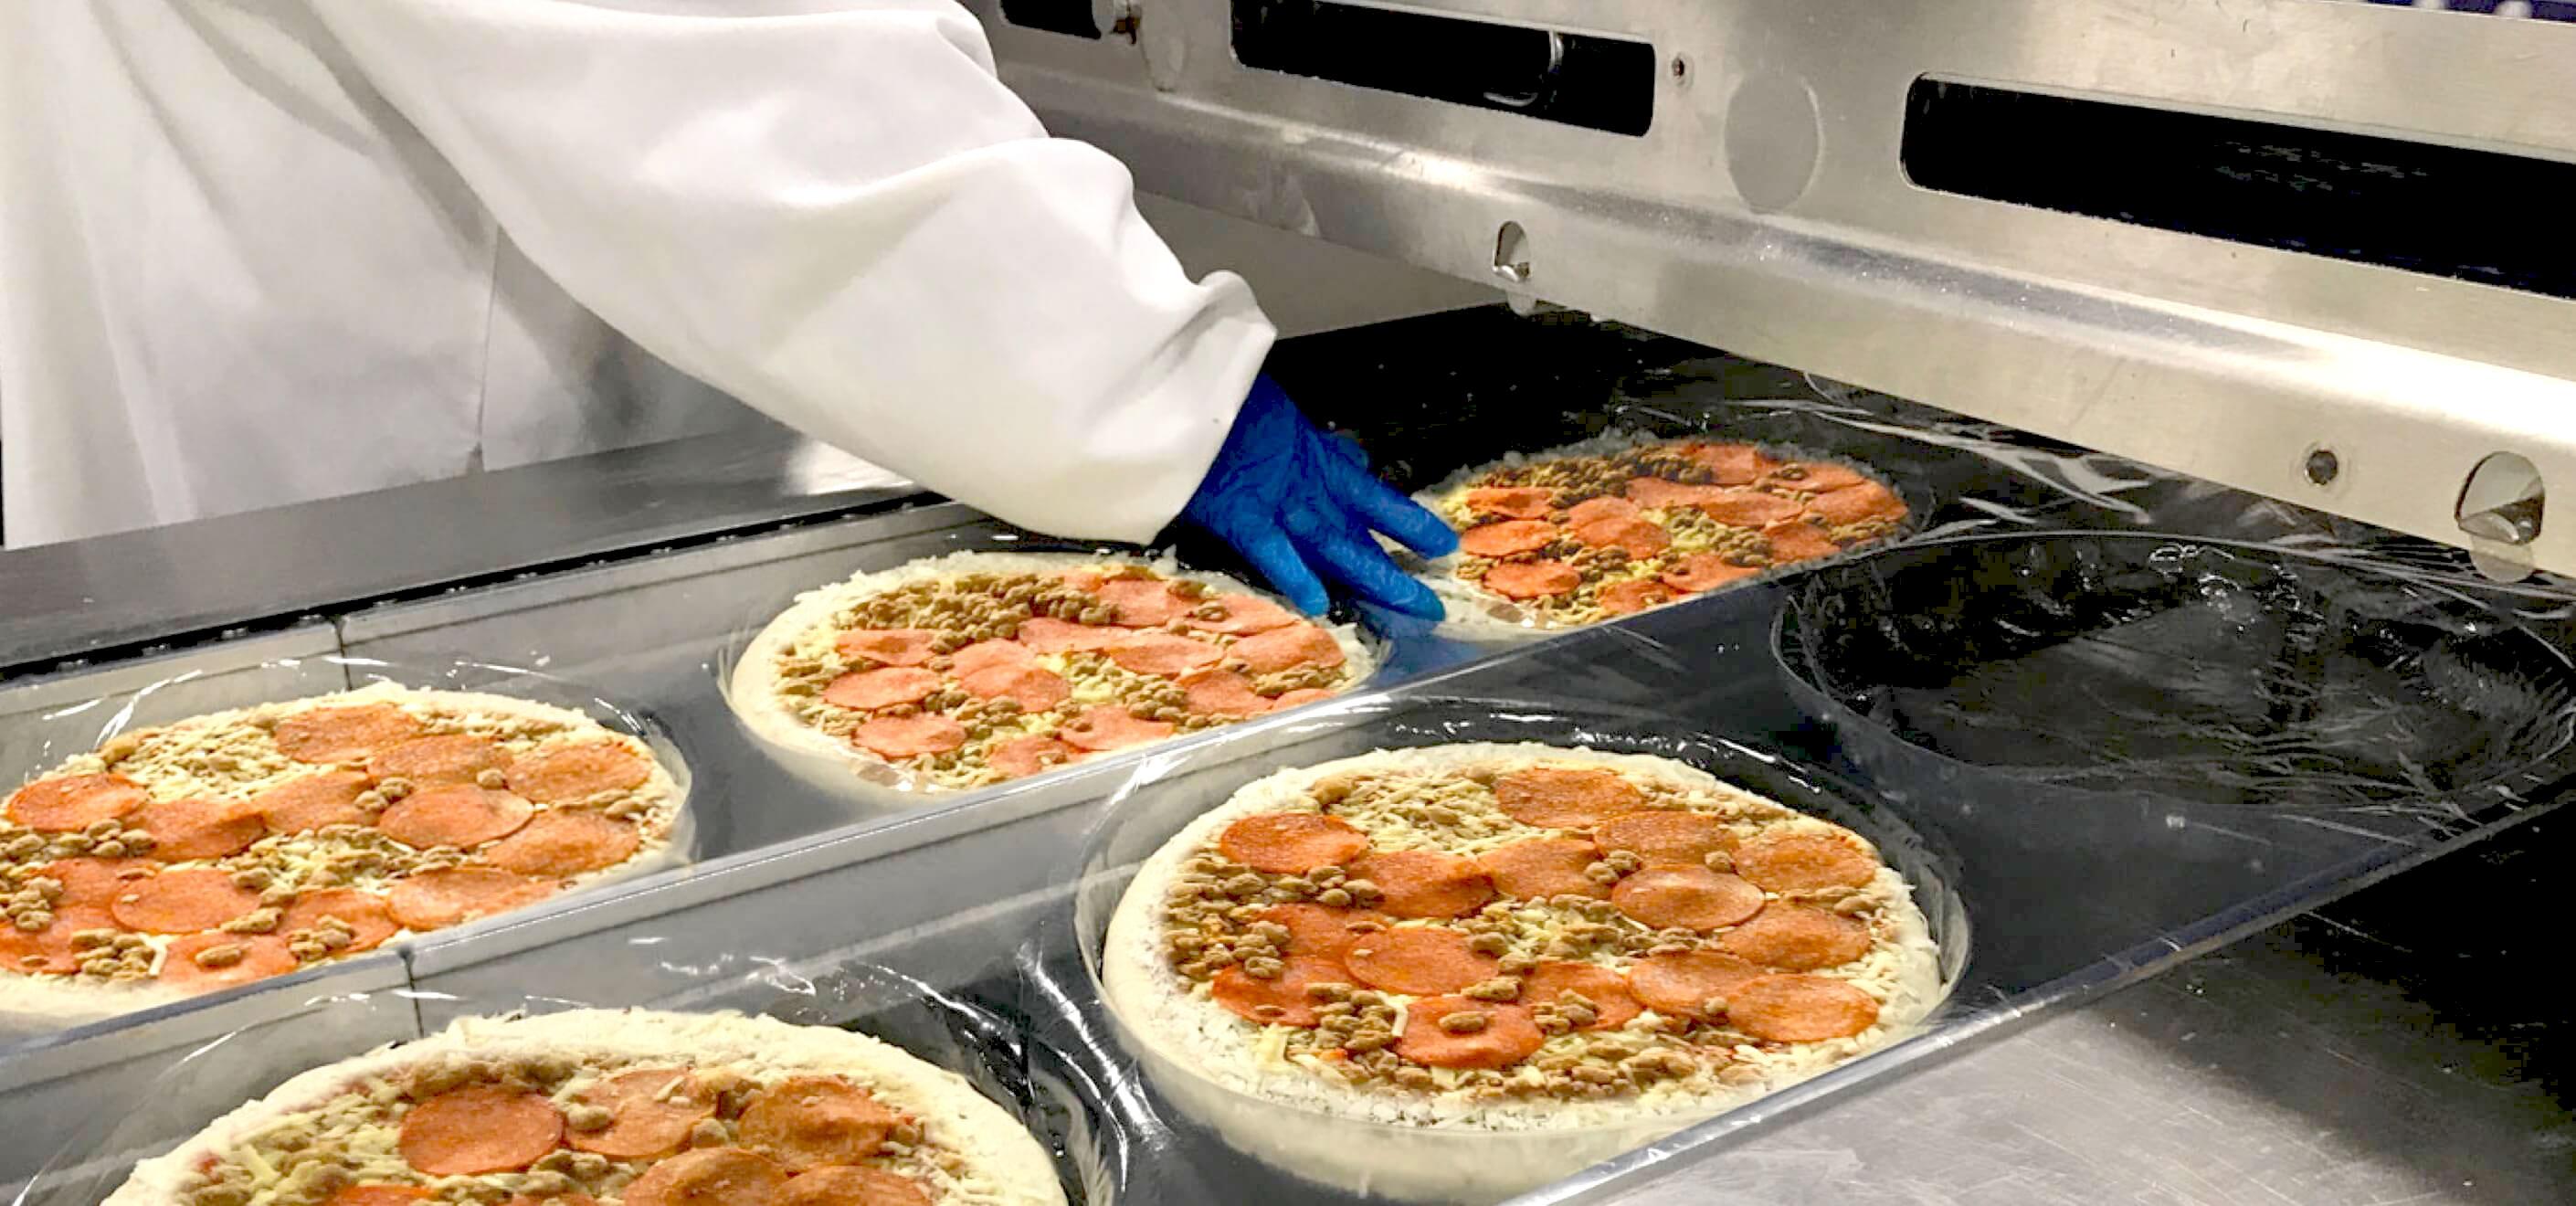 Pizza getting vacuum sealed.